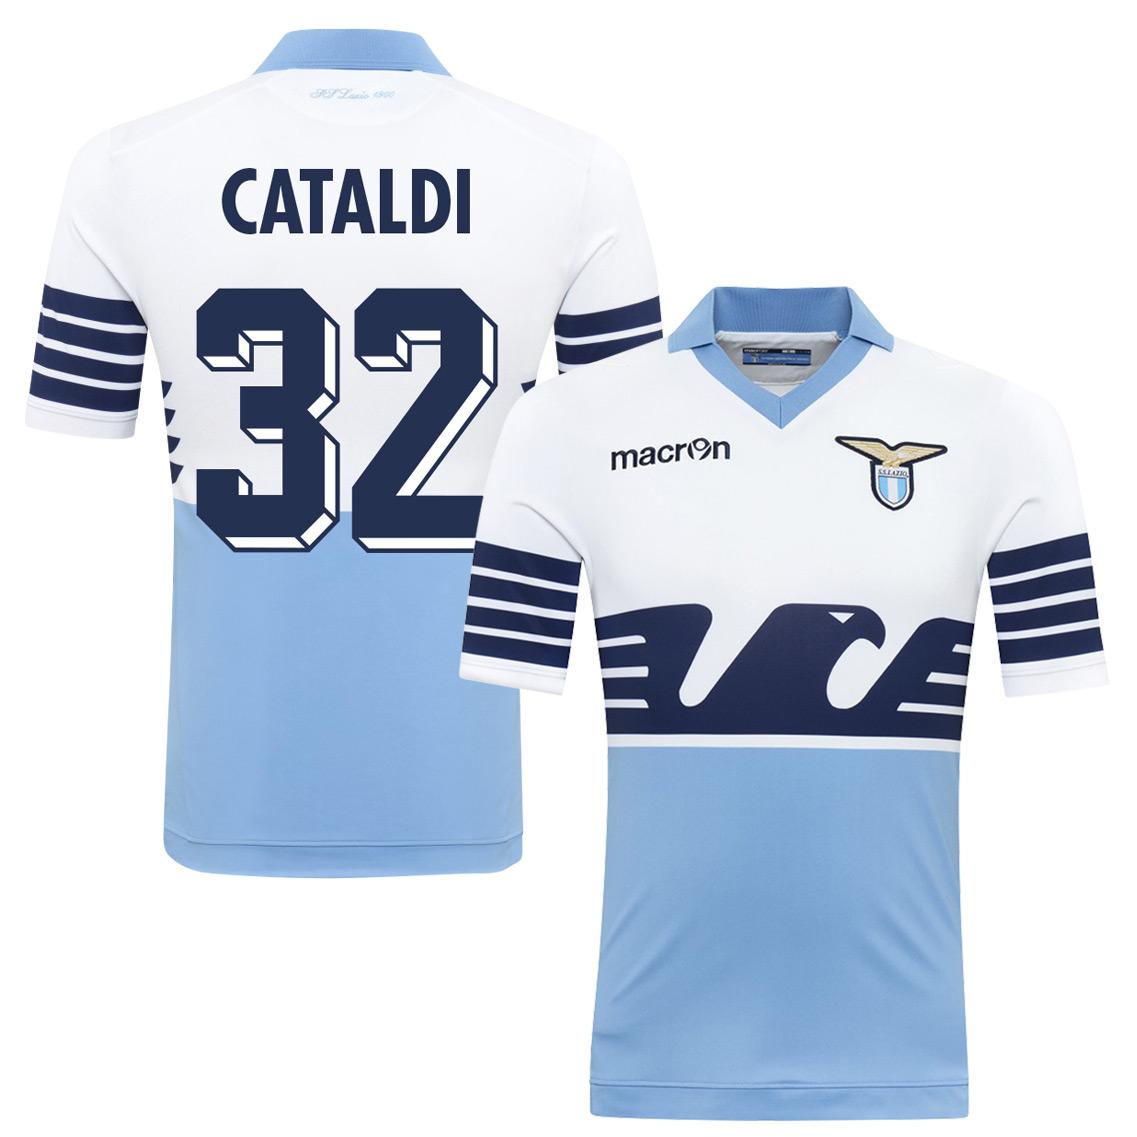 2015 Lazio 115 Year Cataldi Jersey (Fan Style Printing) - M